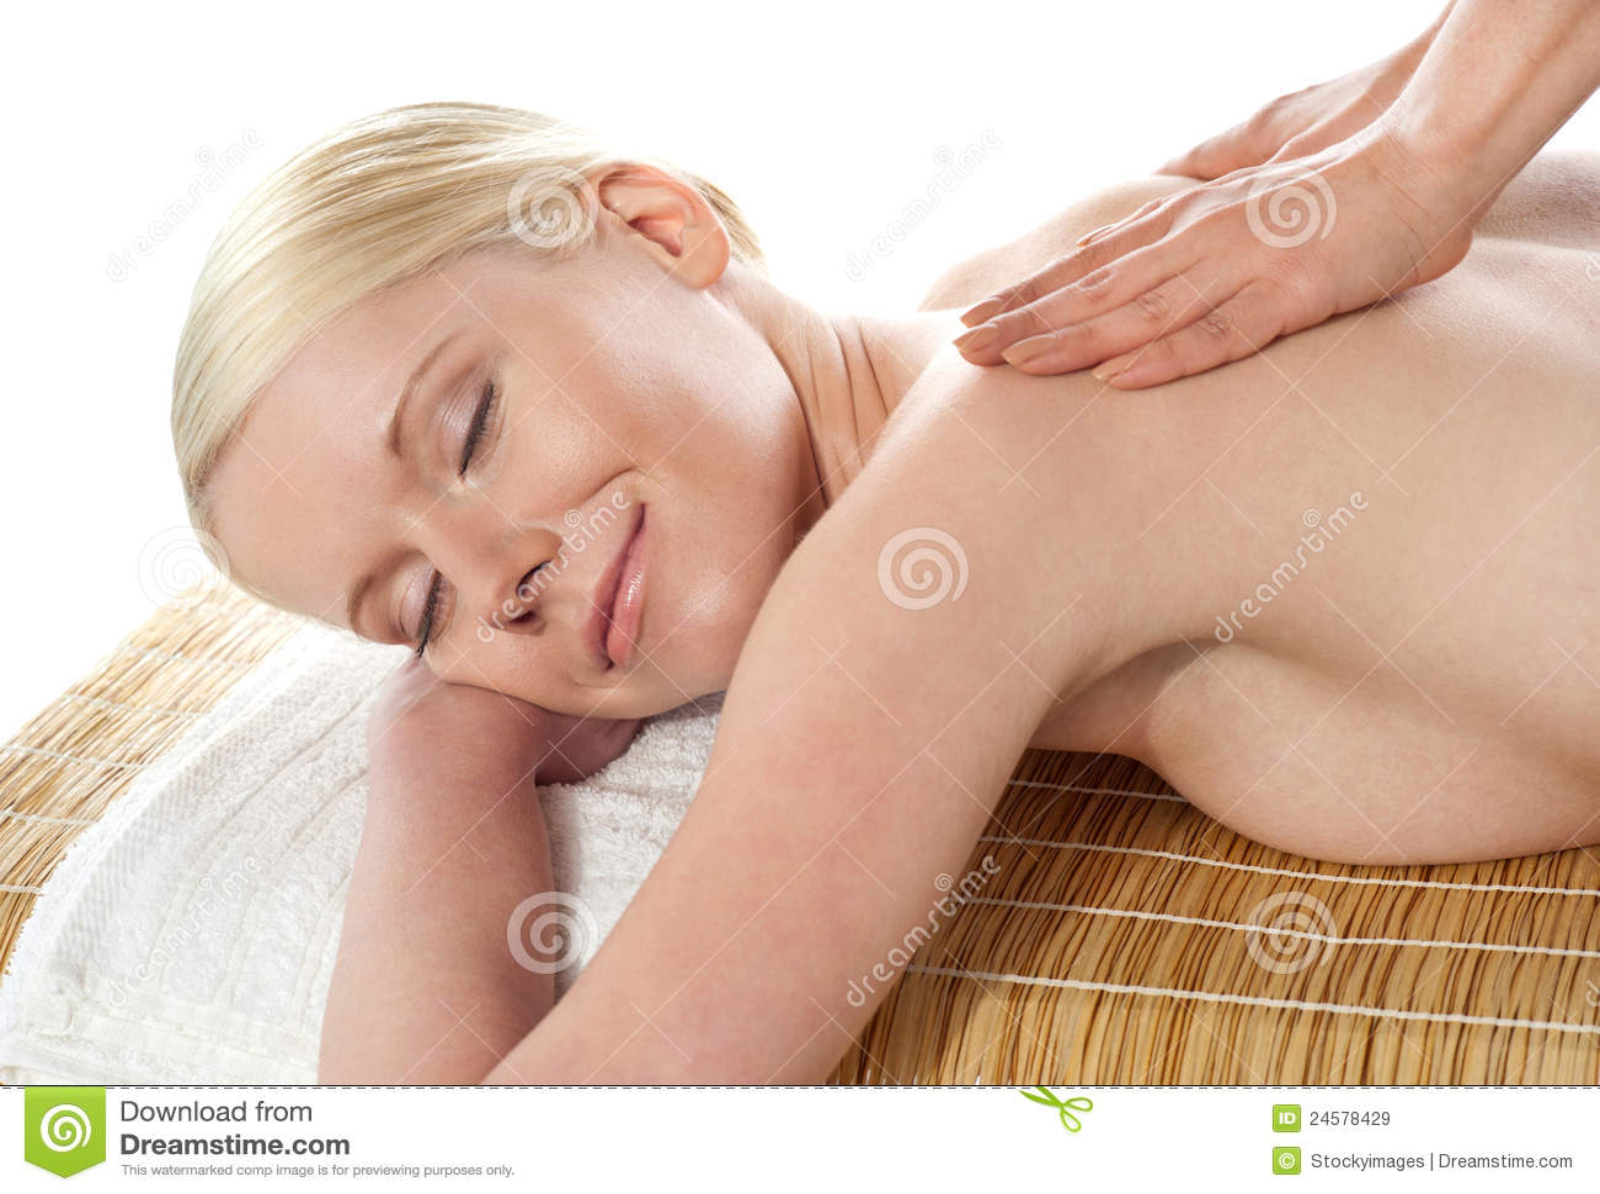 massage erotic nude svenska kvinnor nakna